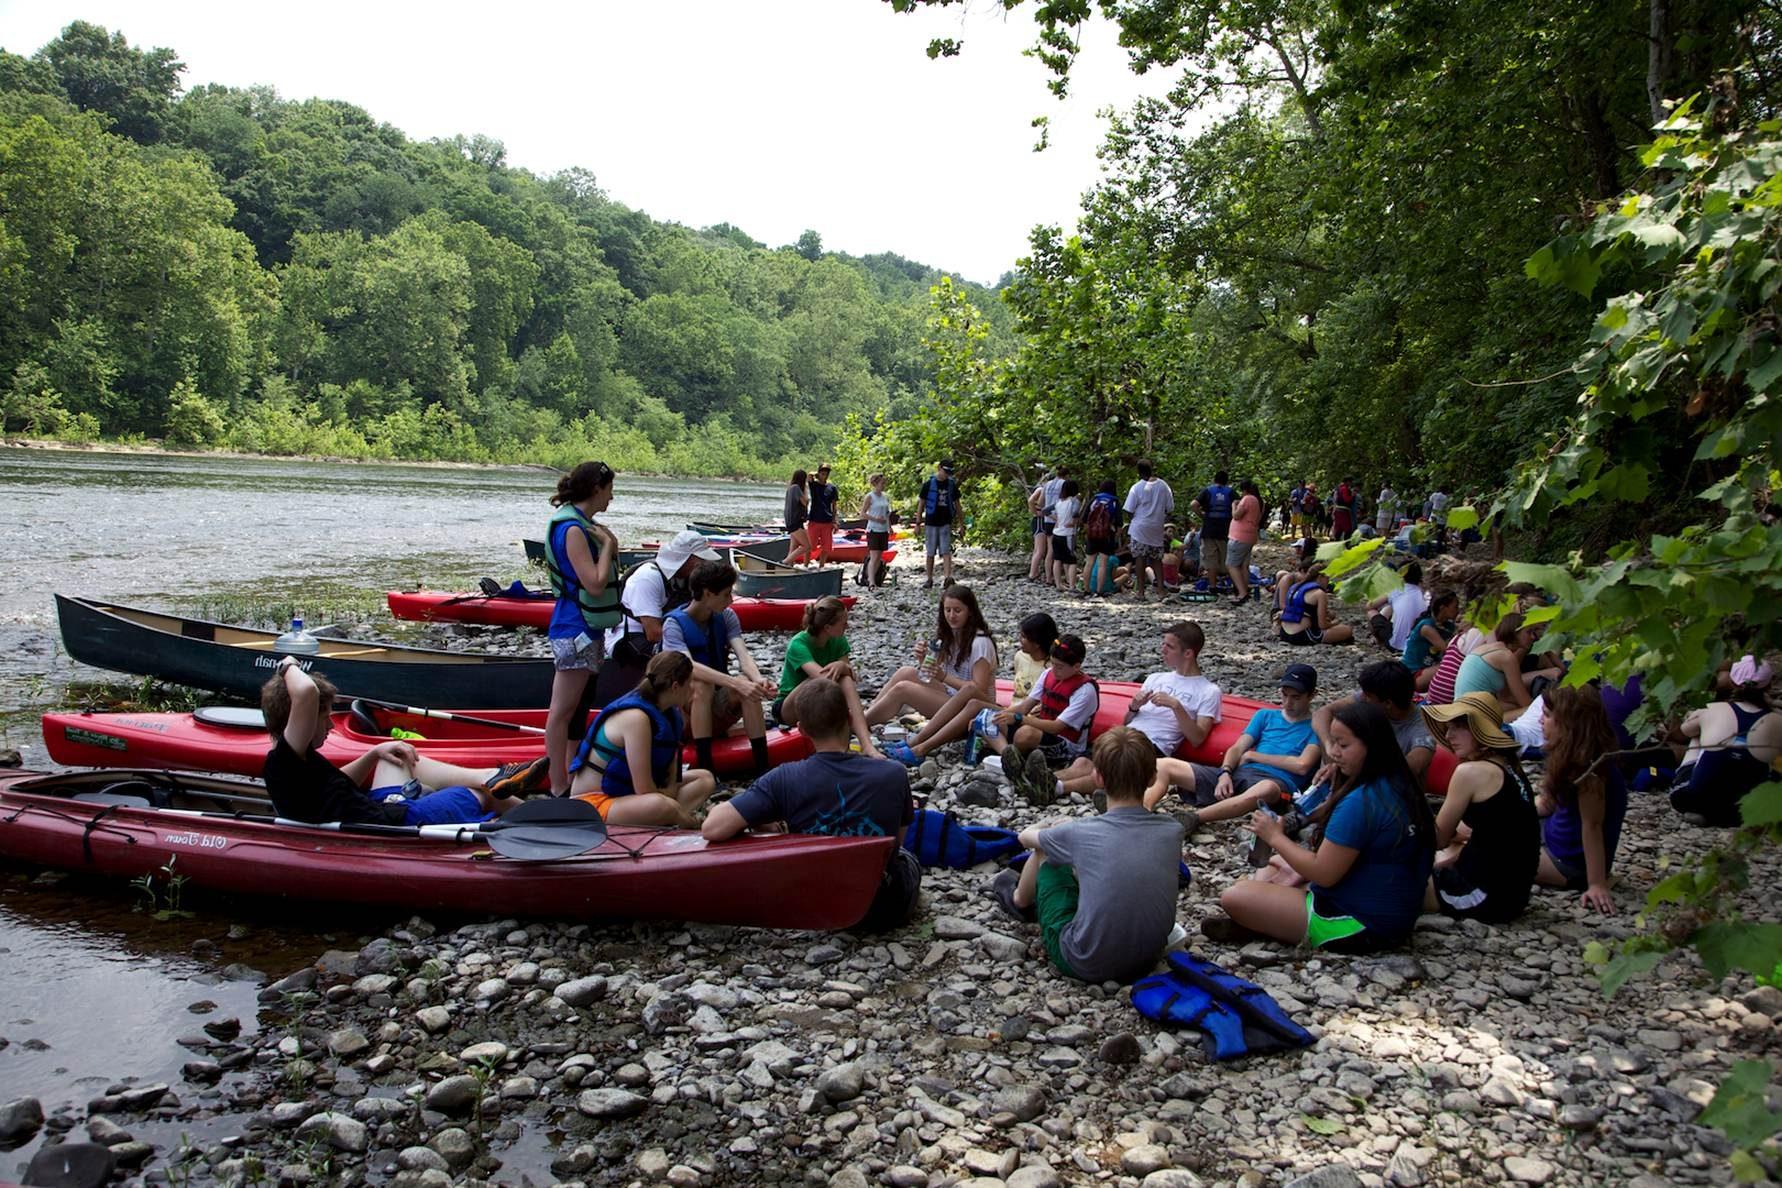 Free photograph; kayak, rest, people, crowd